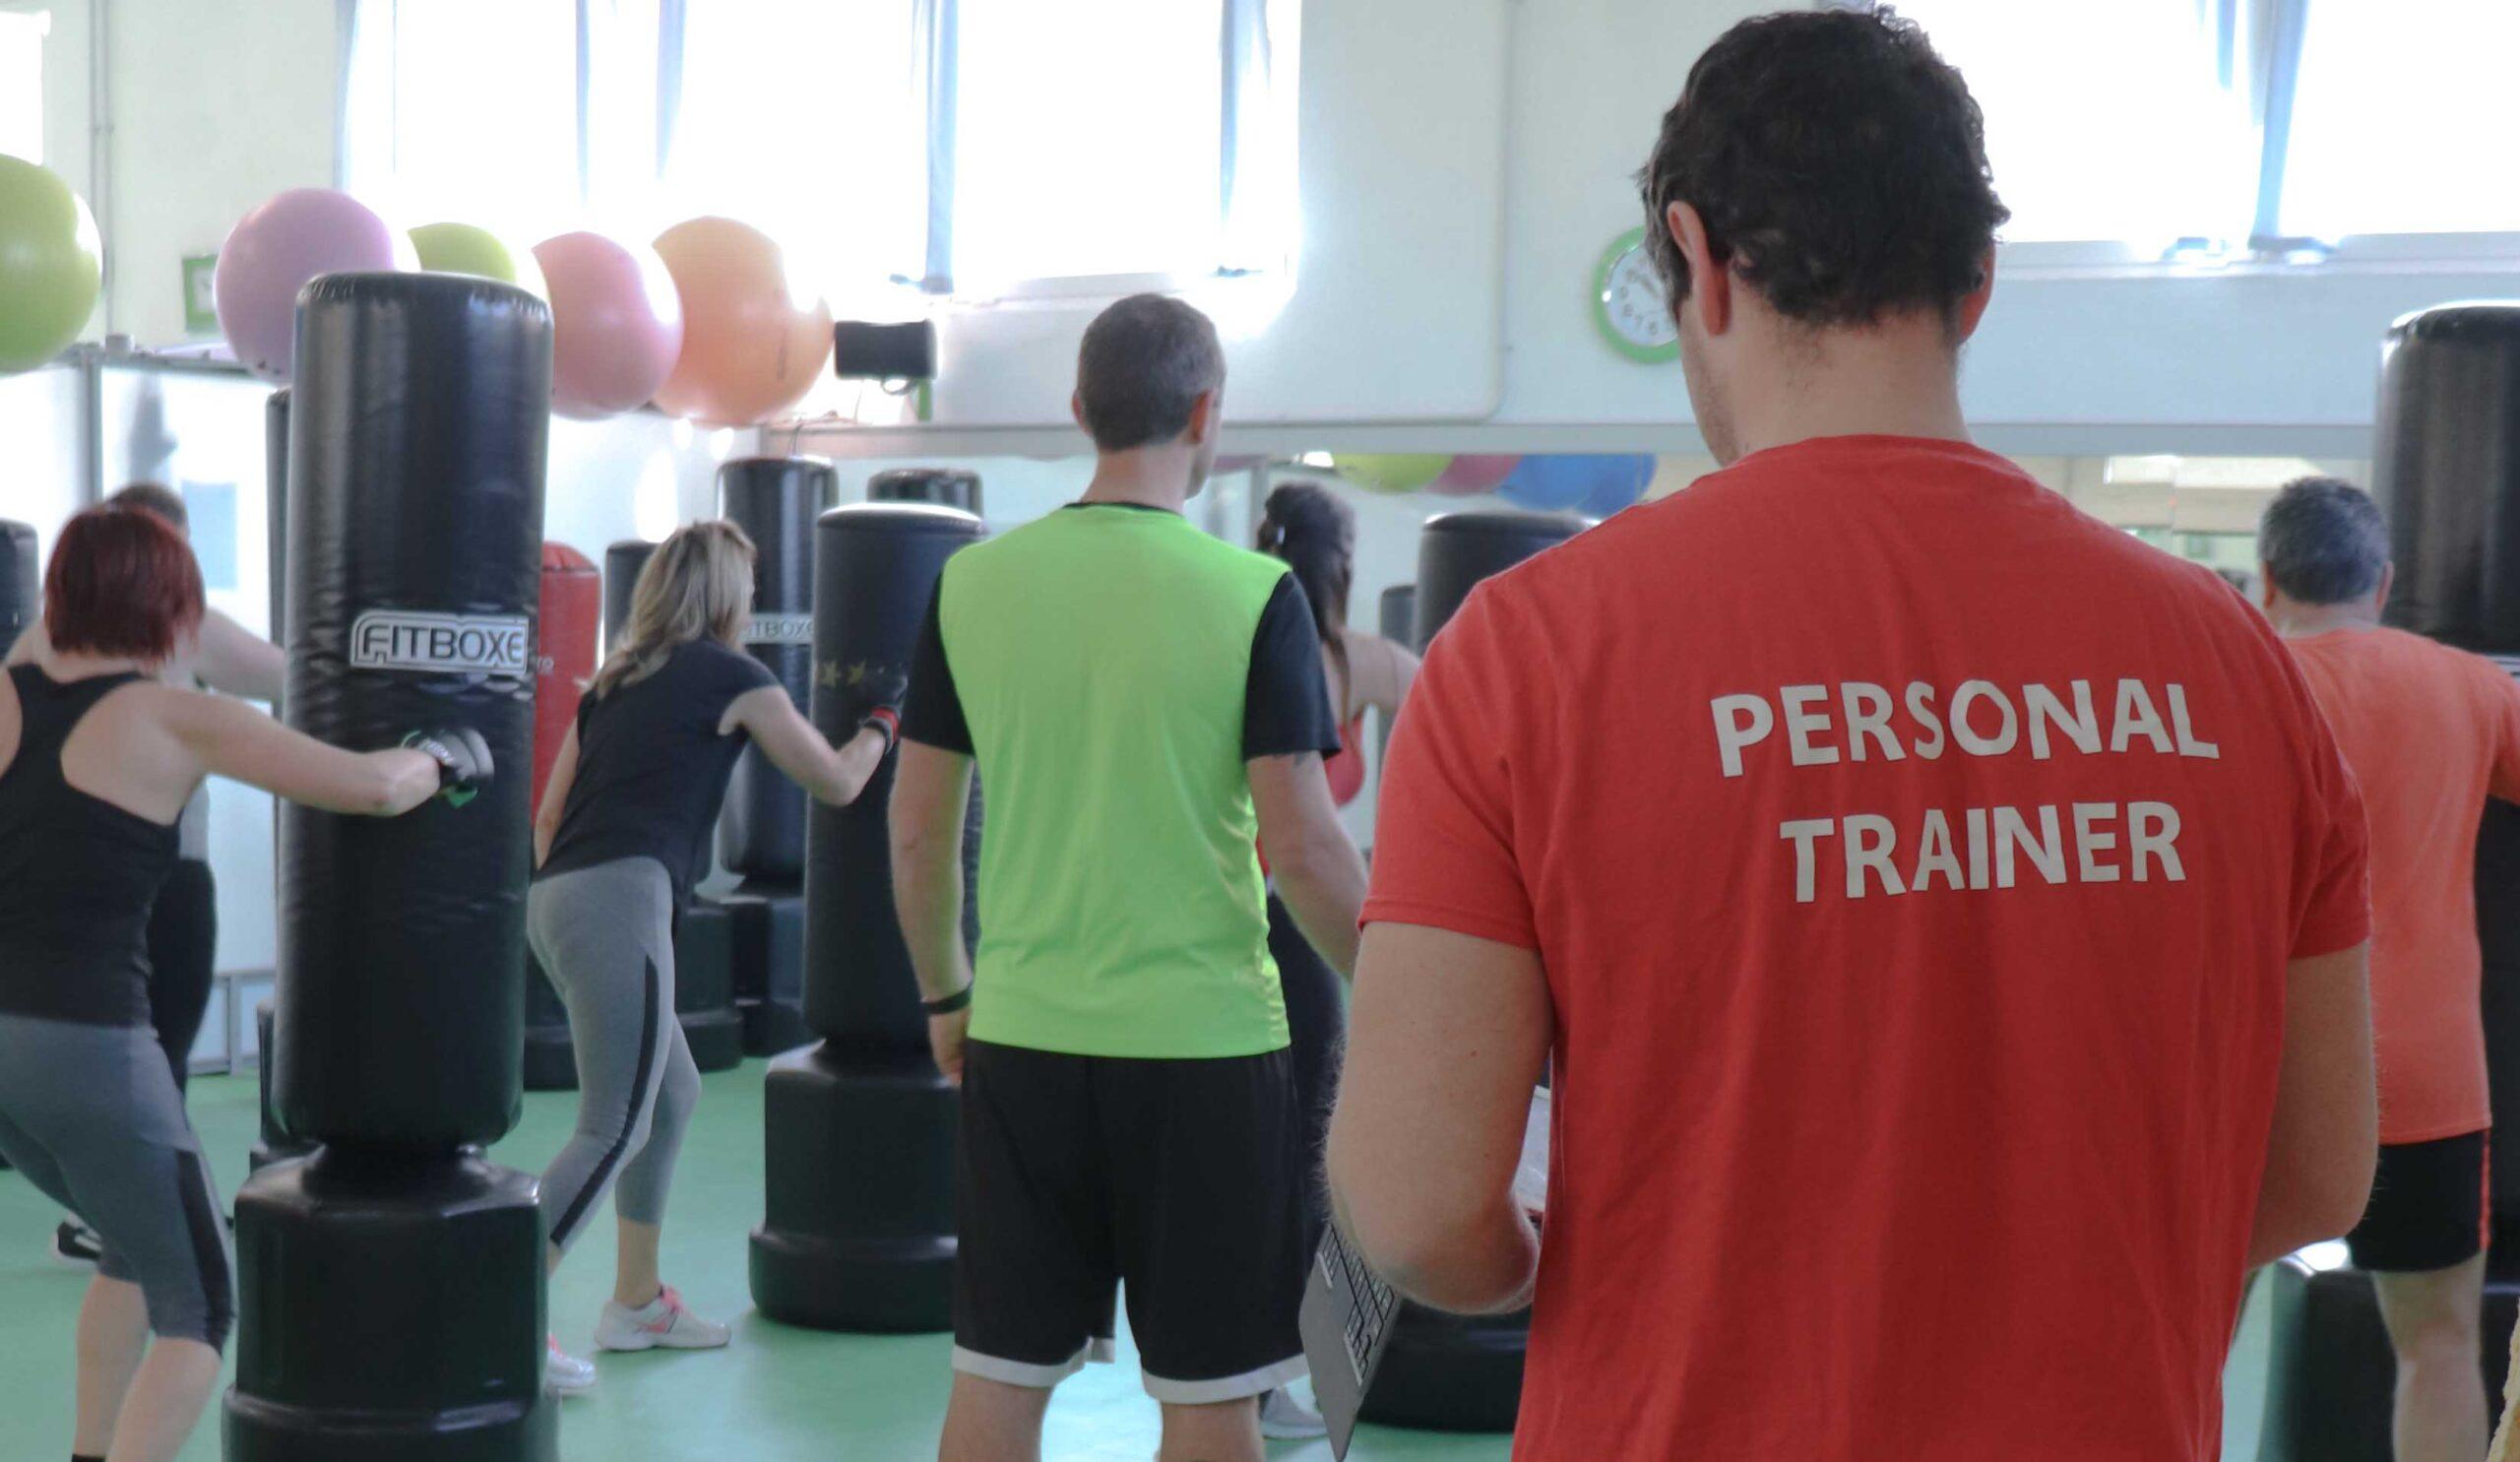 Personal trainer allena persone in una palestra di Galliate